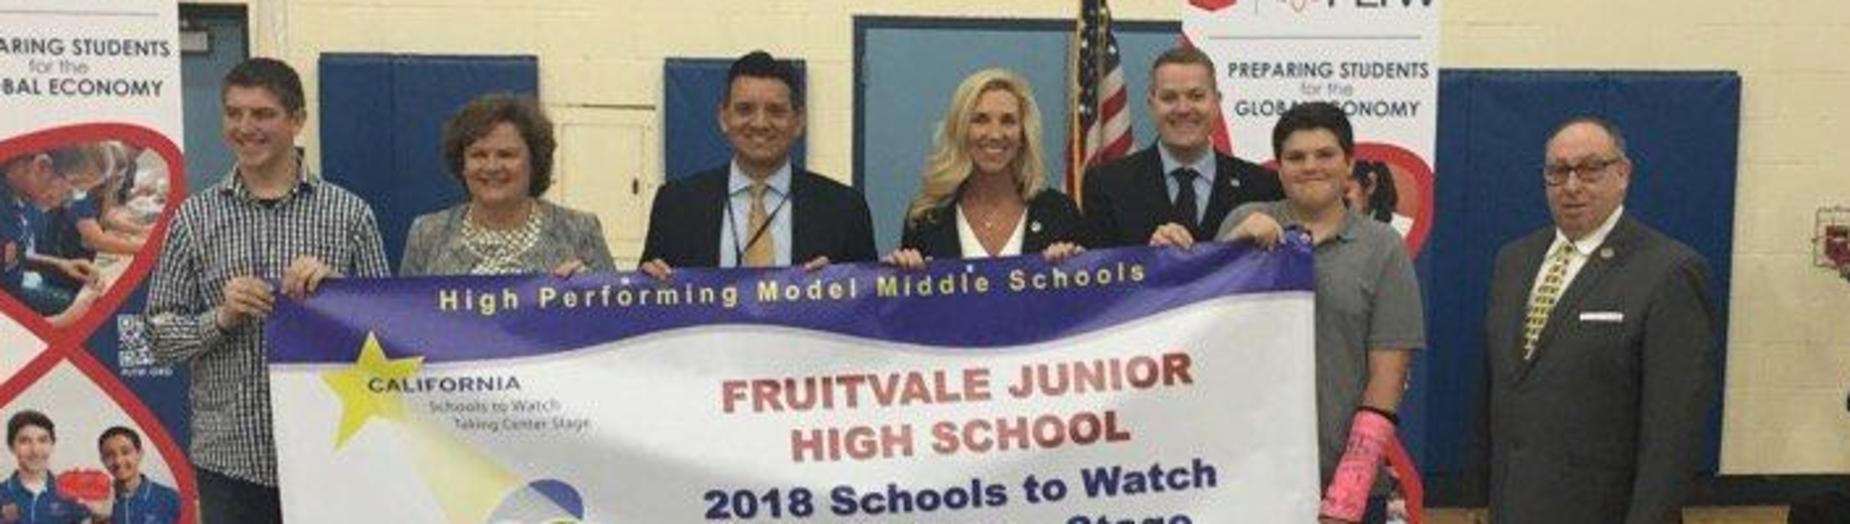 Fruitvale Junior High School